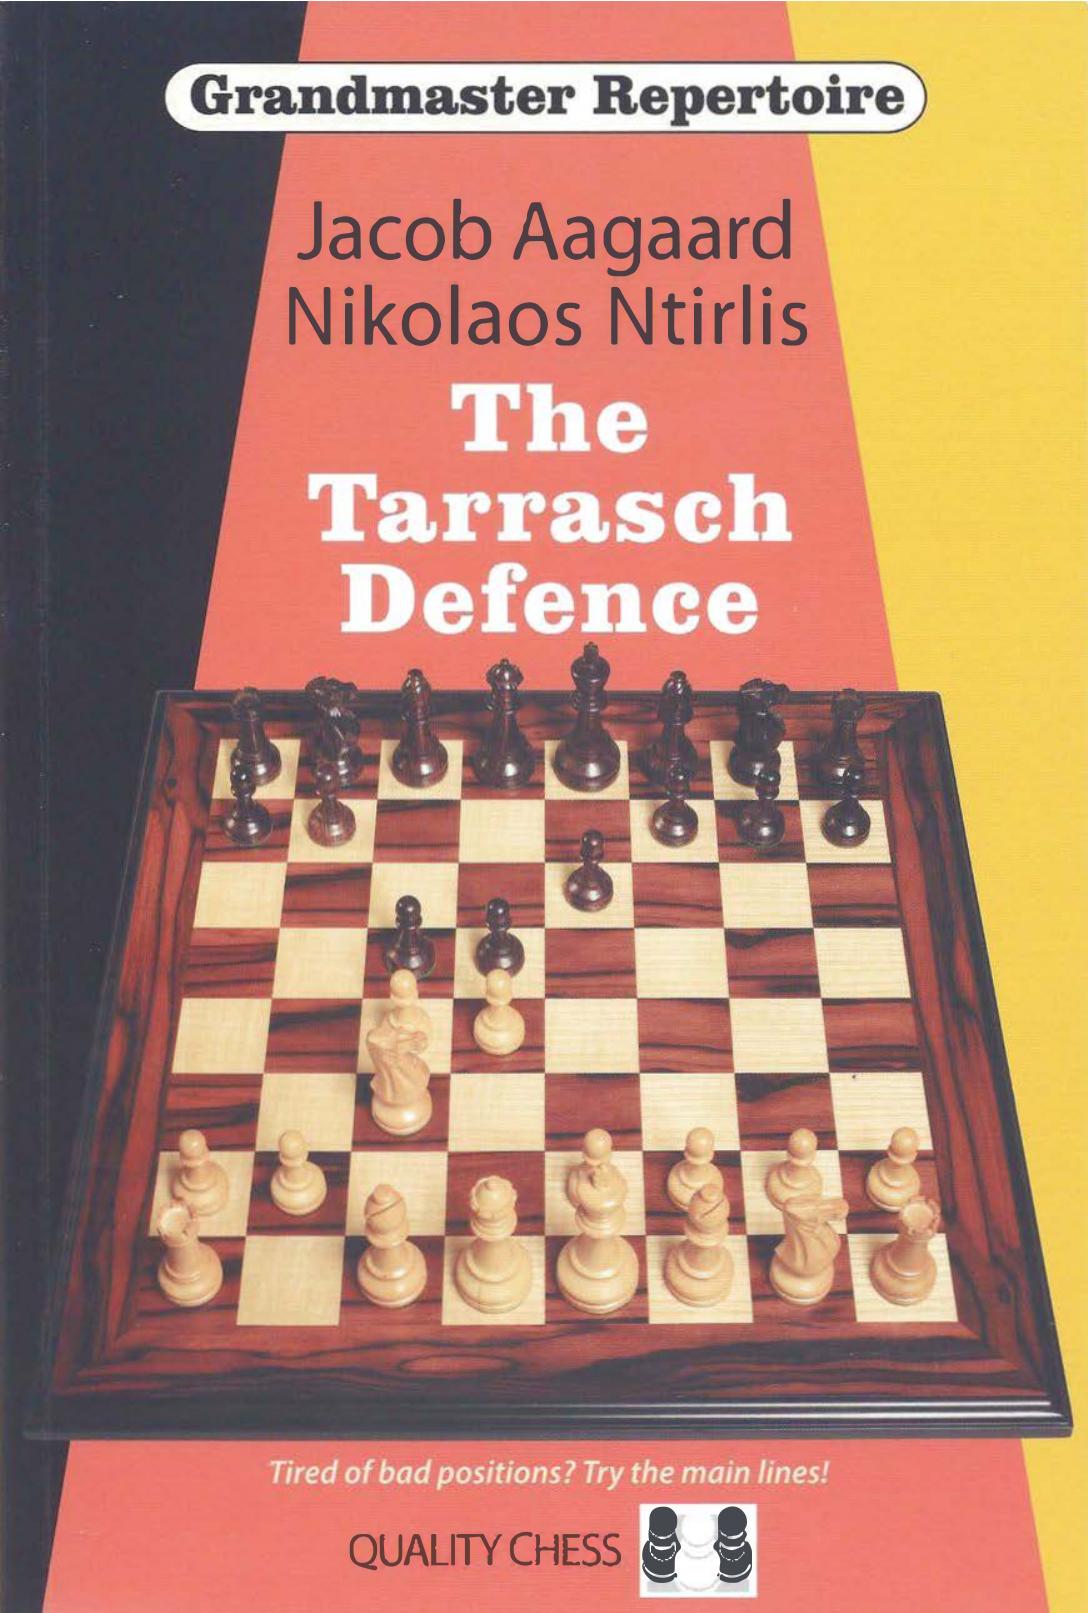 Grandmaster Repertoire 10 The Tarrasch Defence